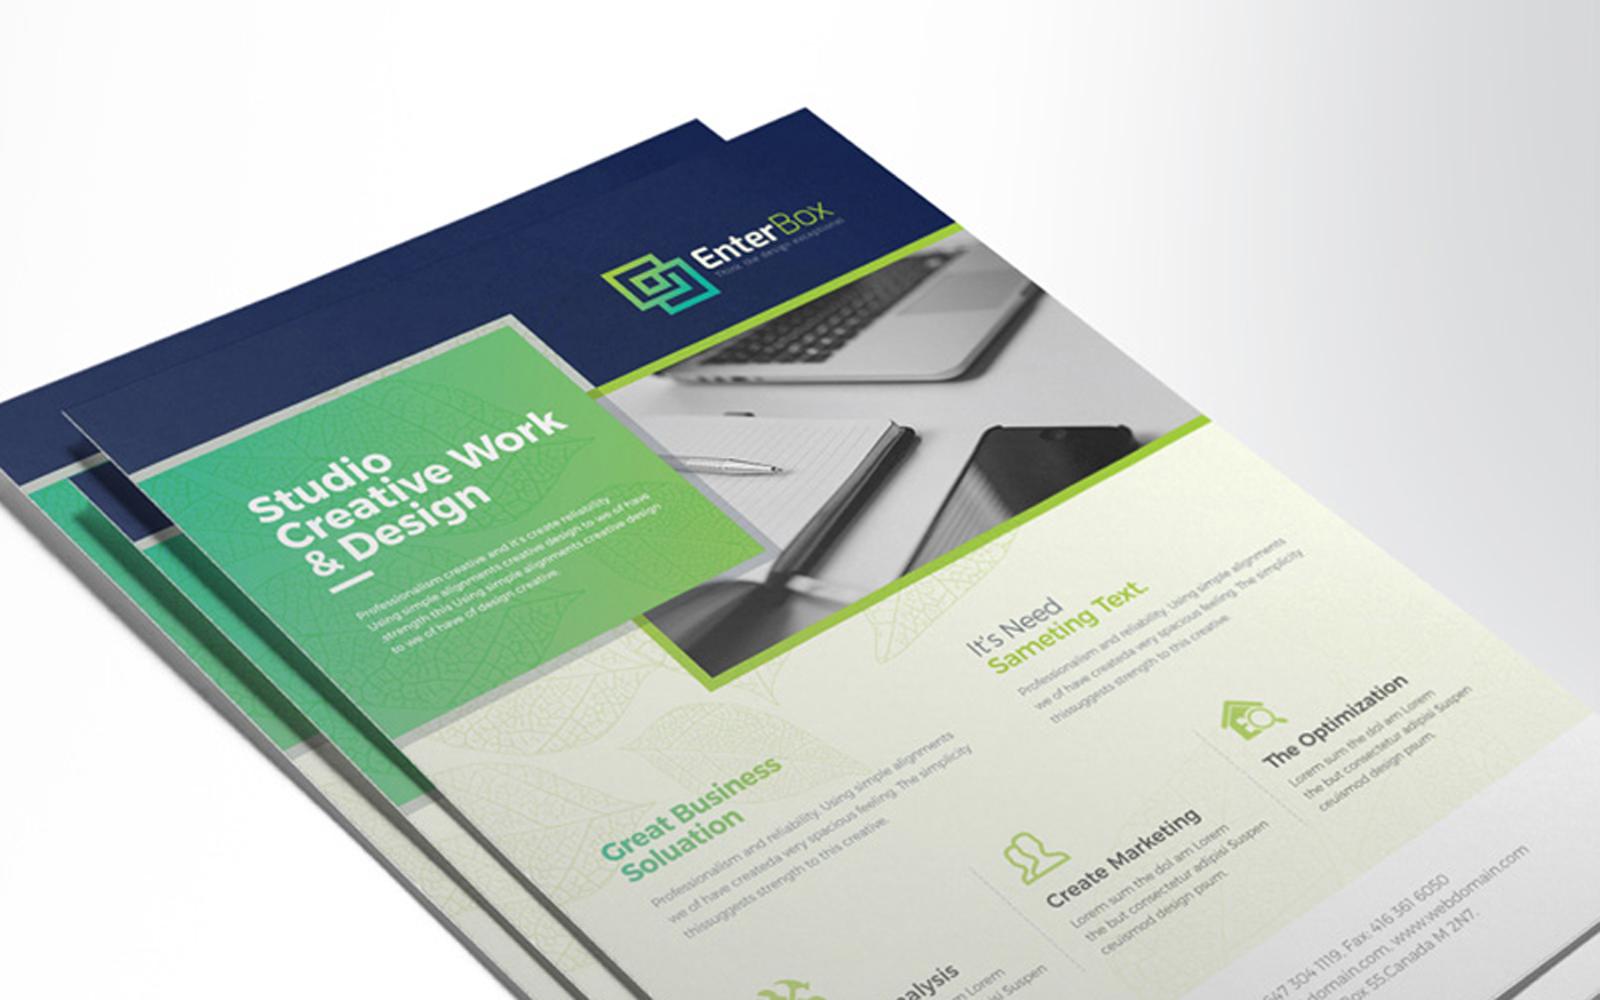 Water Color & Creative Clean Design Corporate Identity Template